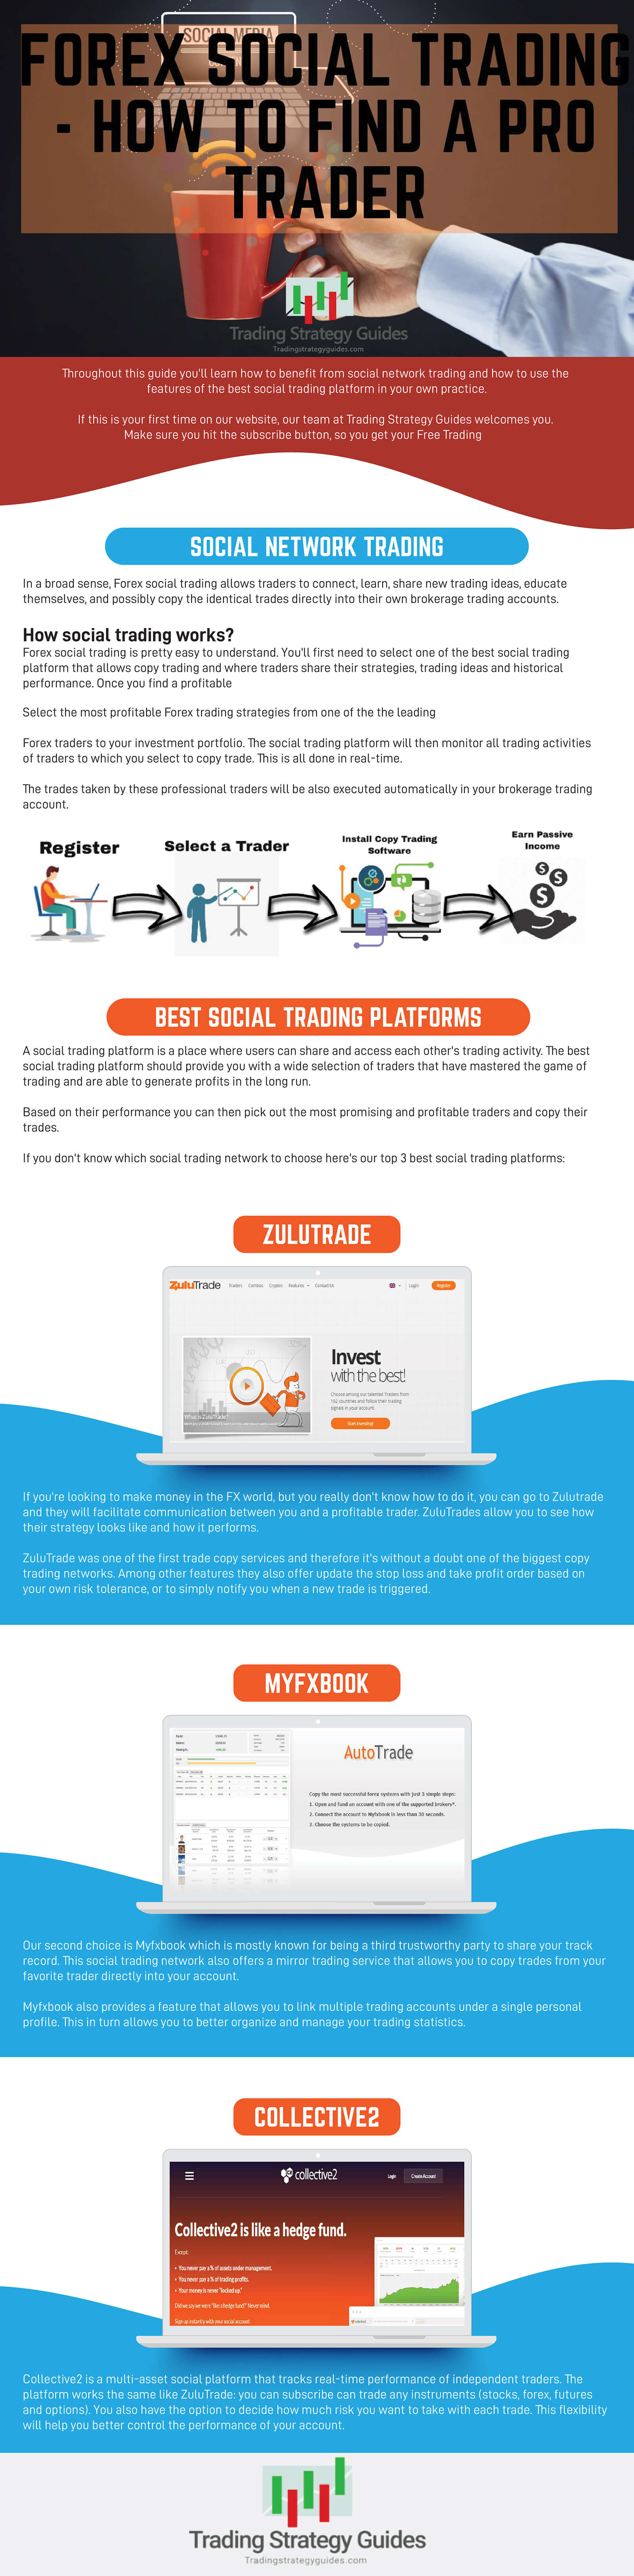 best social trading platform infographic